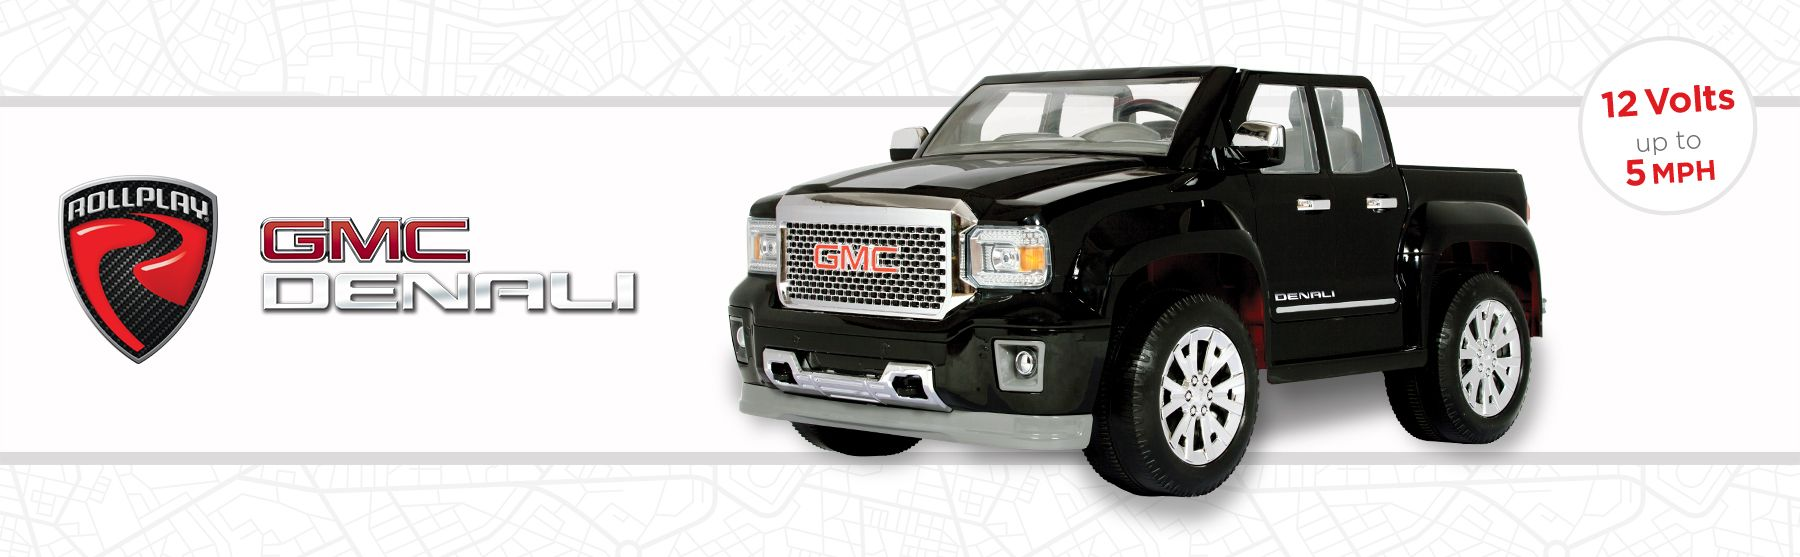 e185acbeb Rollplay GMC Sierra Denali 12 Volt Battery Ride-On Vehicle, Black ...